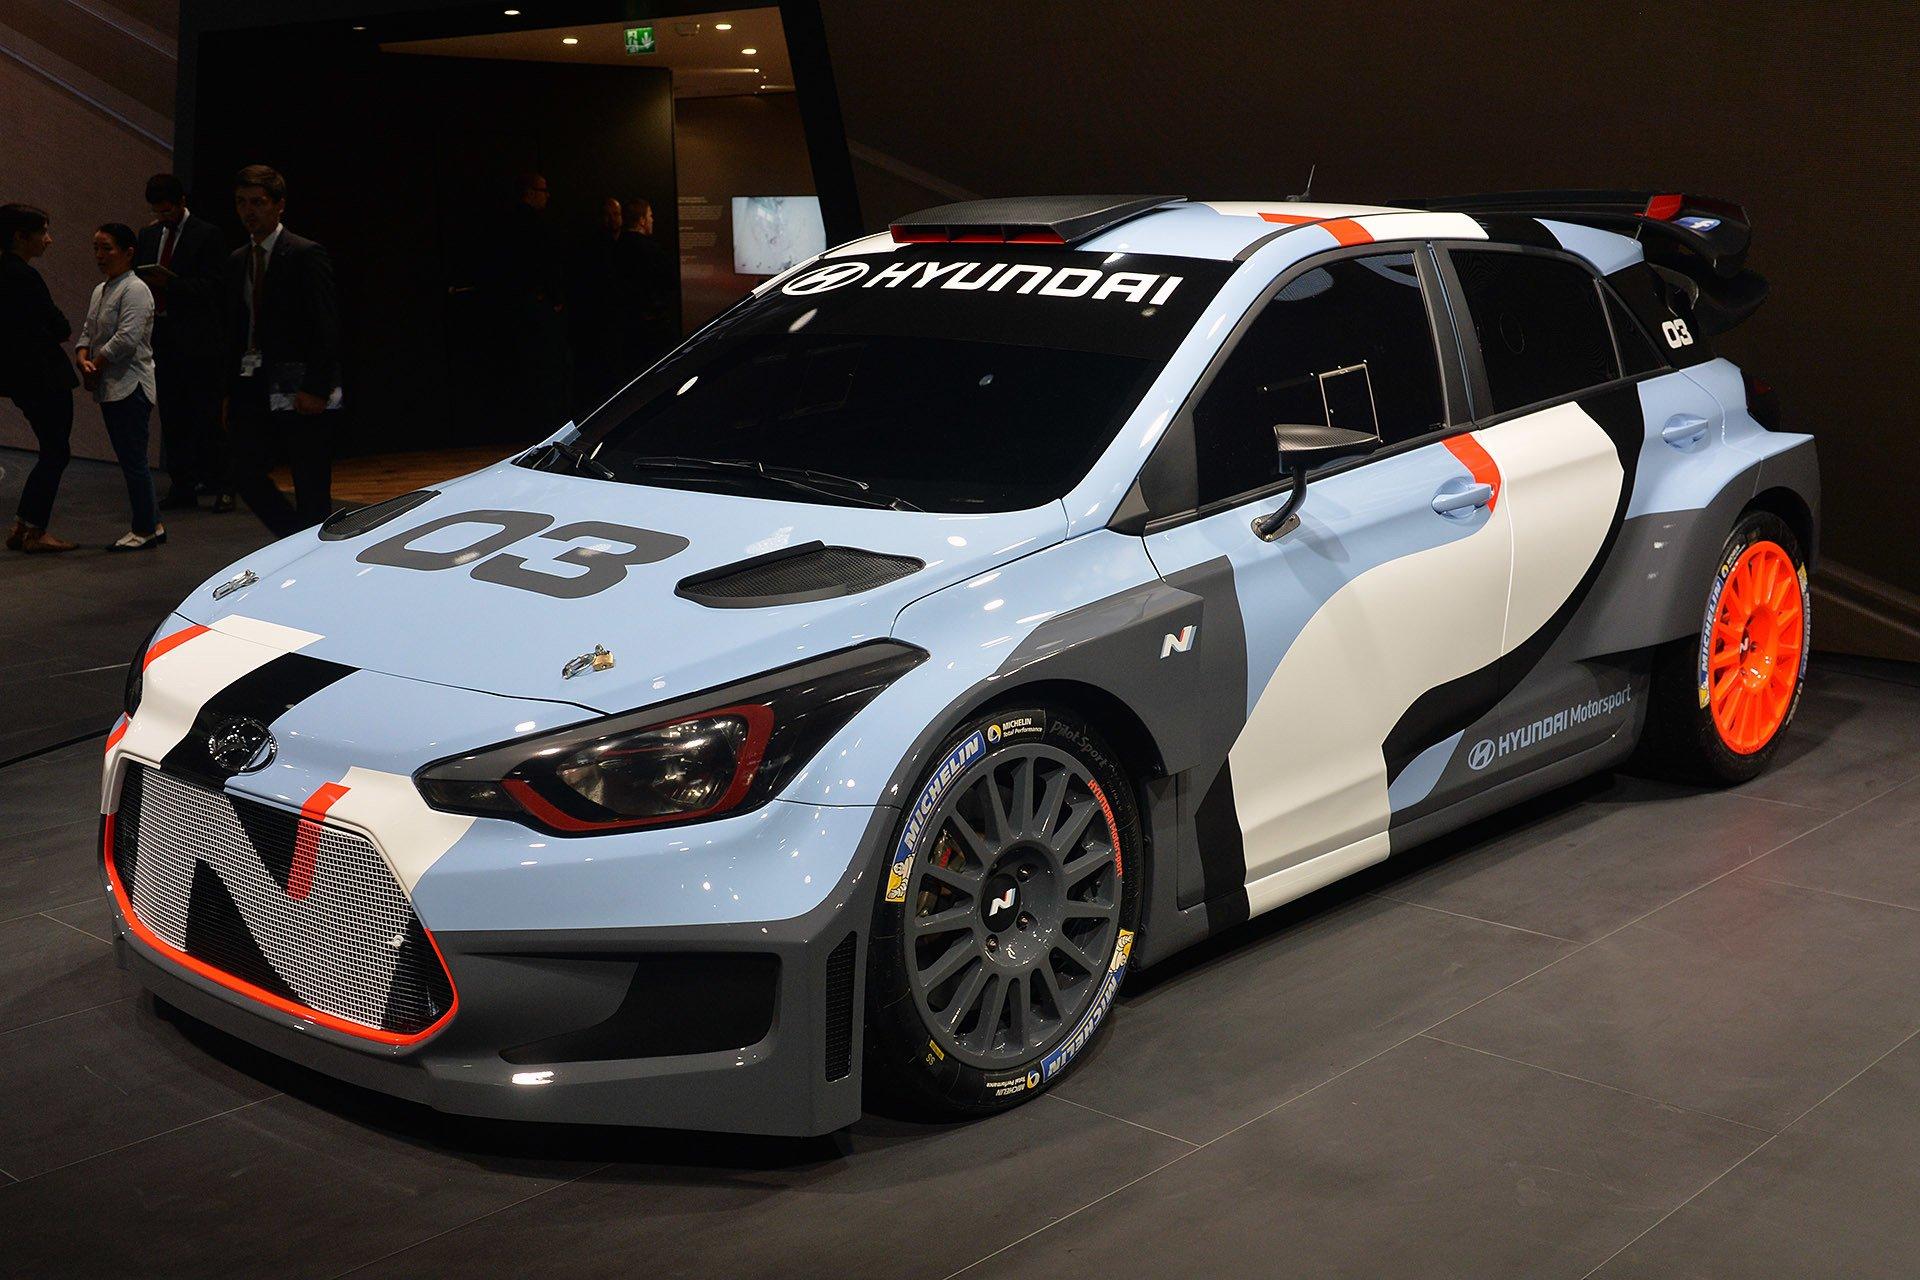 2016 cars hyundai i20 racecars rally wrc wallpaper | 1920x1280 | 803655 | WallpaperUP